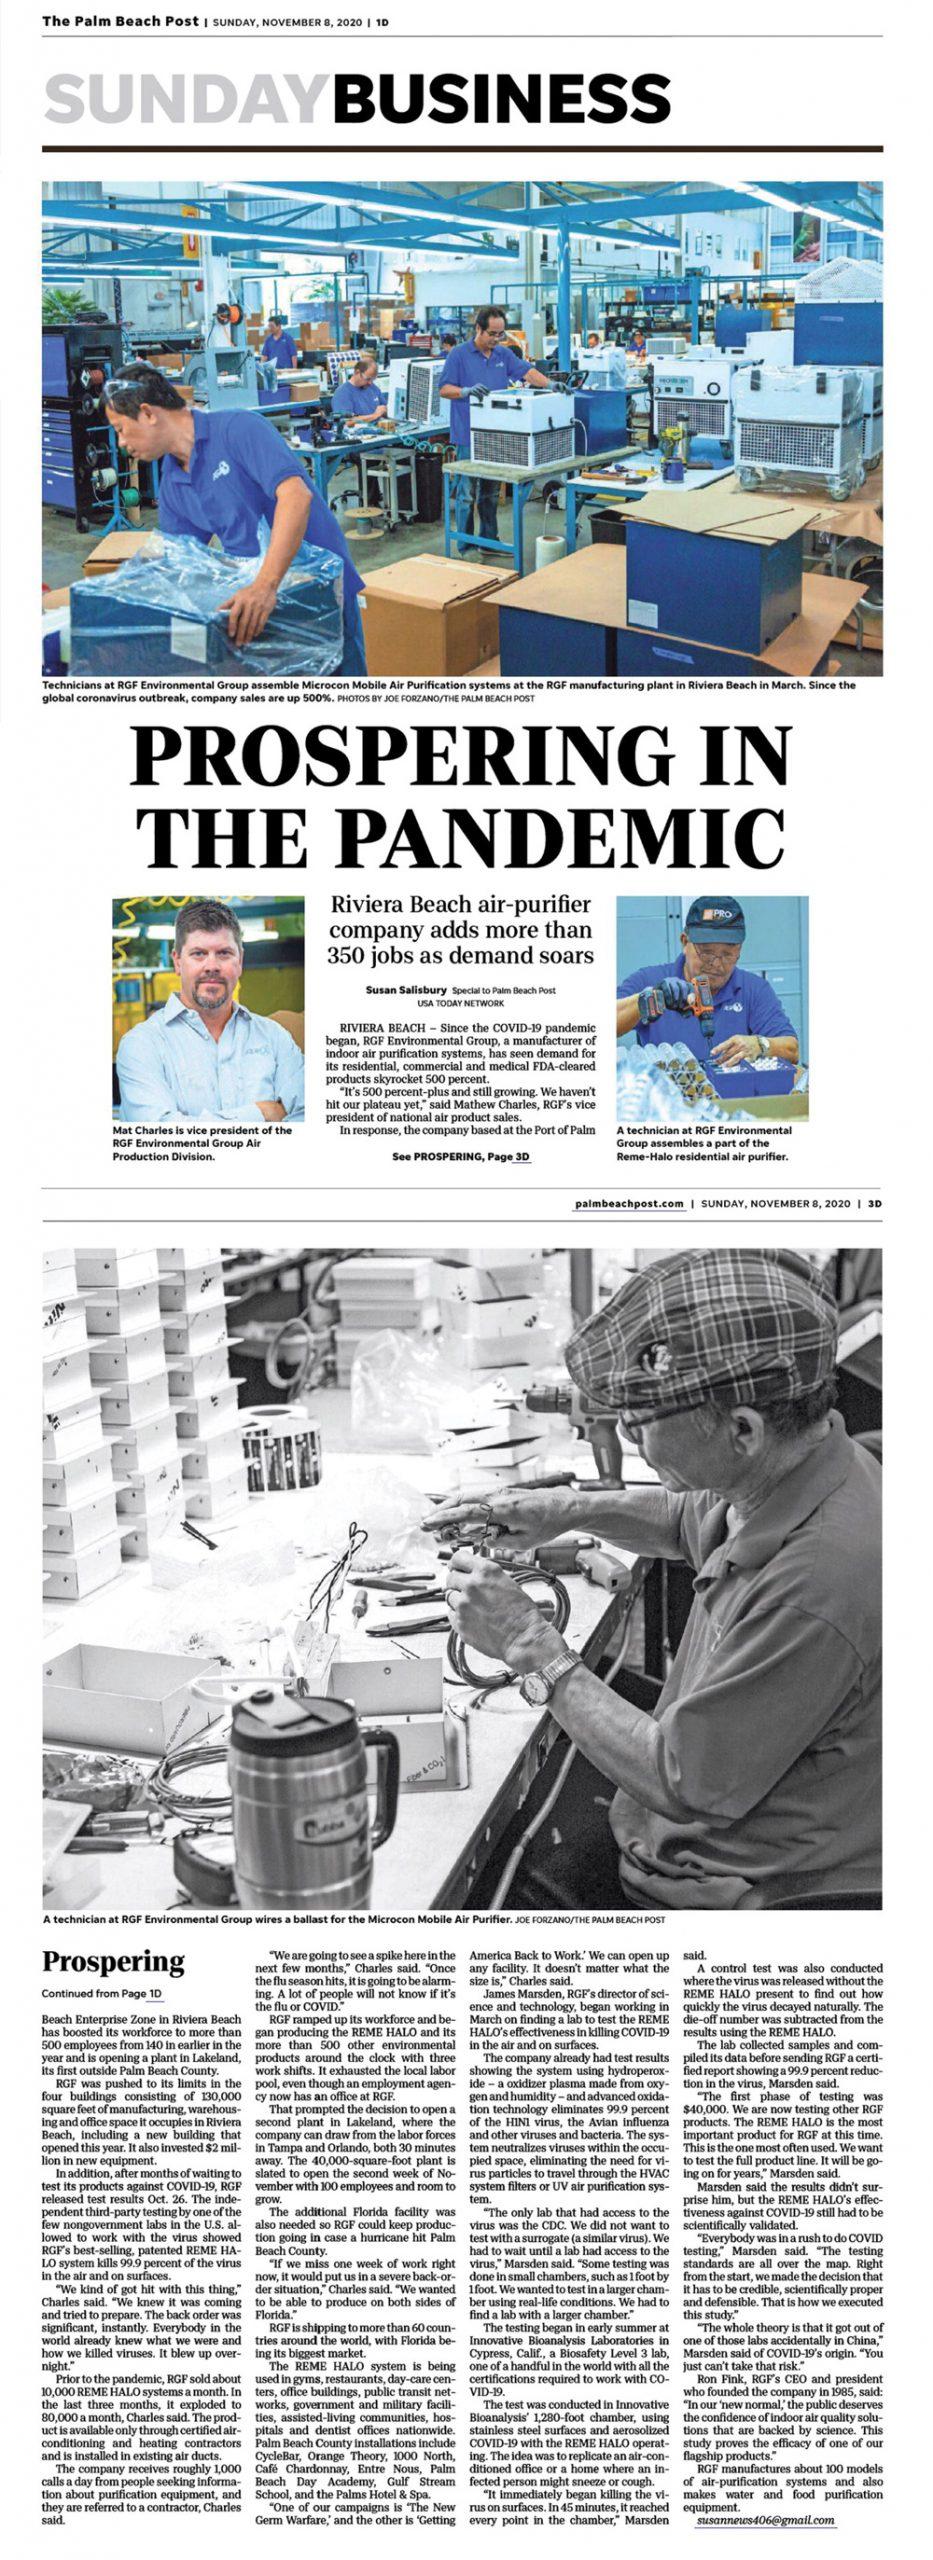 Palm Beach Post, November 2020 - Prospering in the pandemic